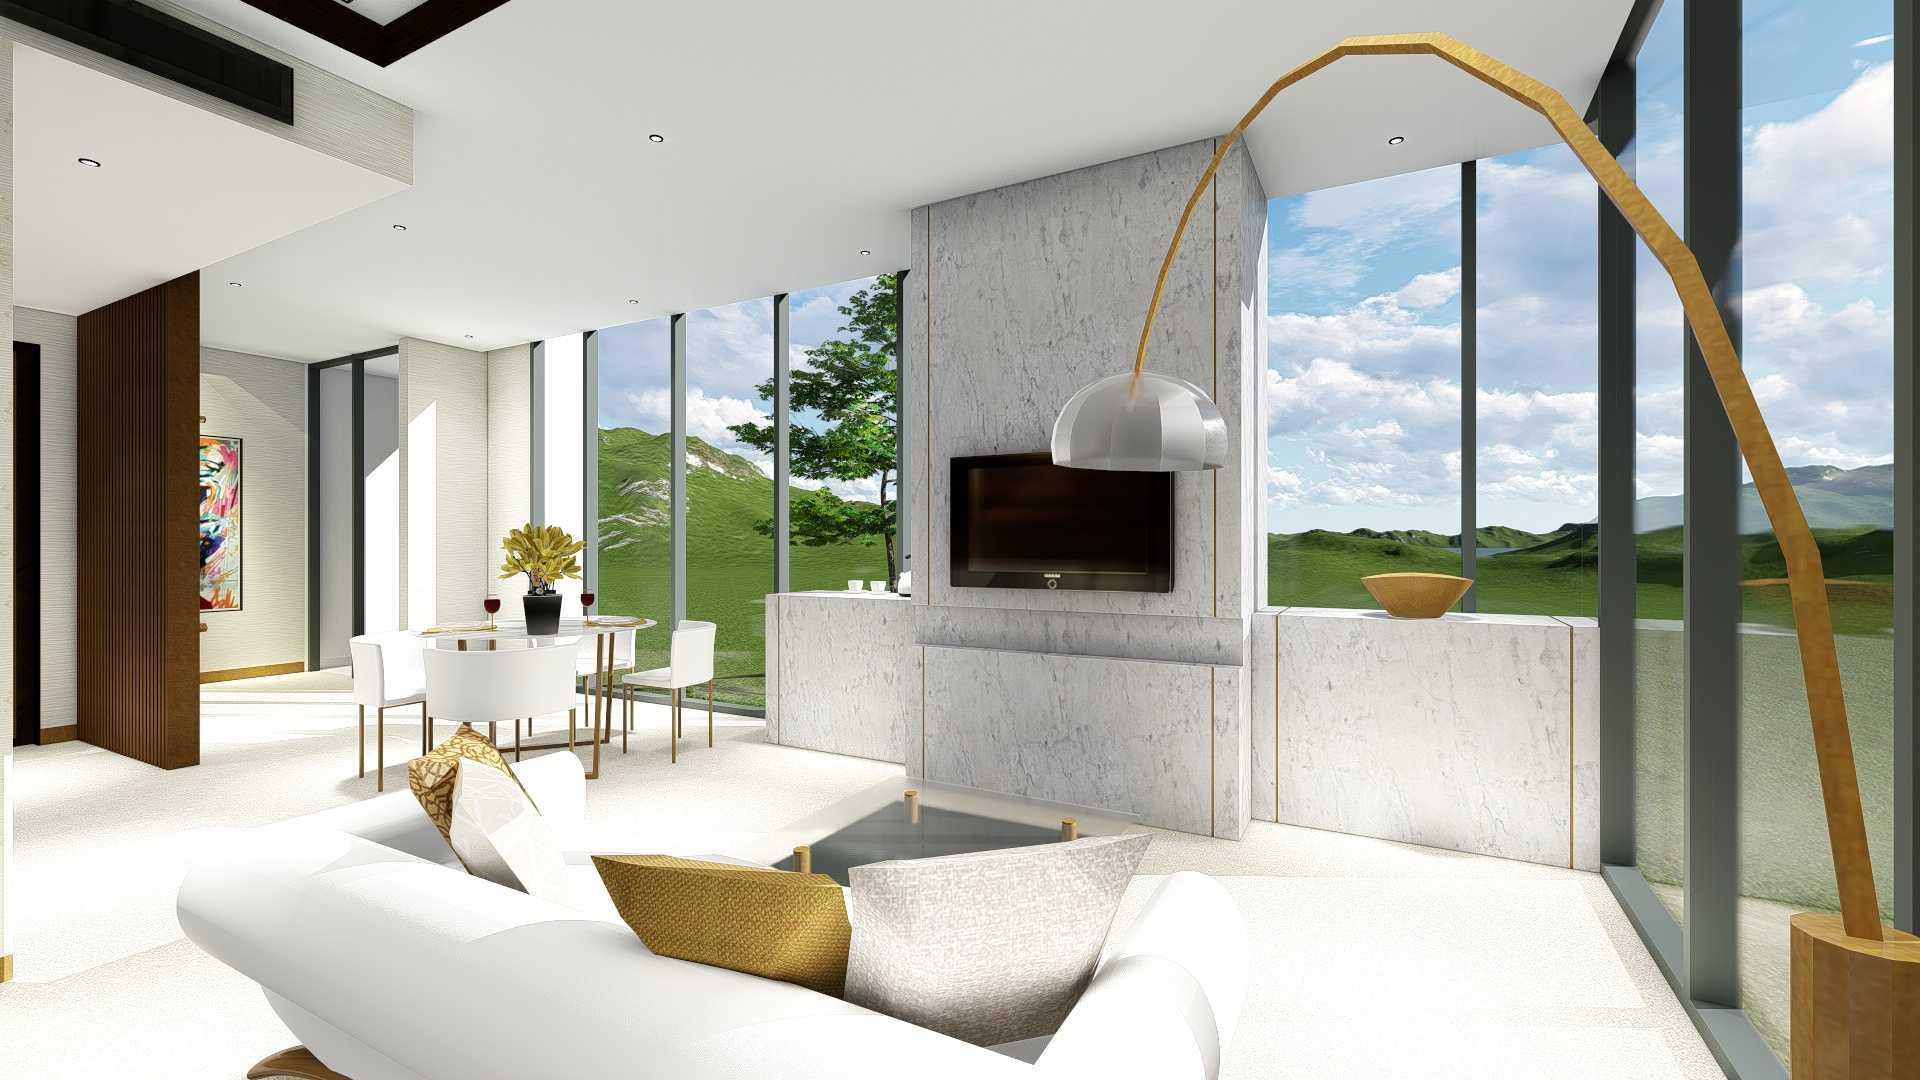 Samitrayasa Design Luxury Hotel Room Alternative 4   304 Kontemporer  32671